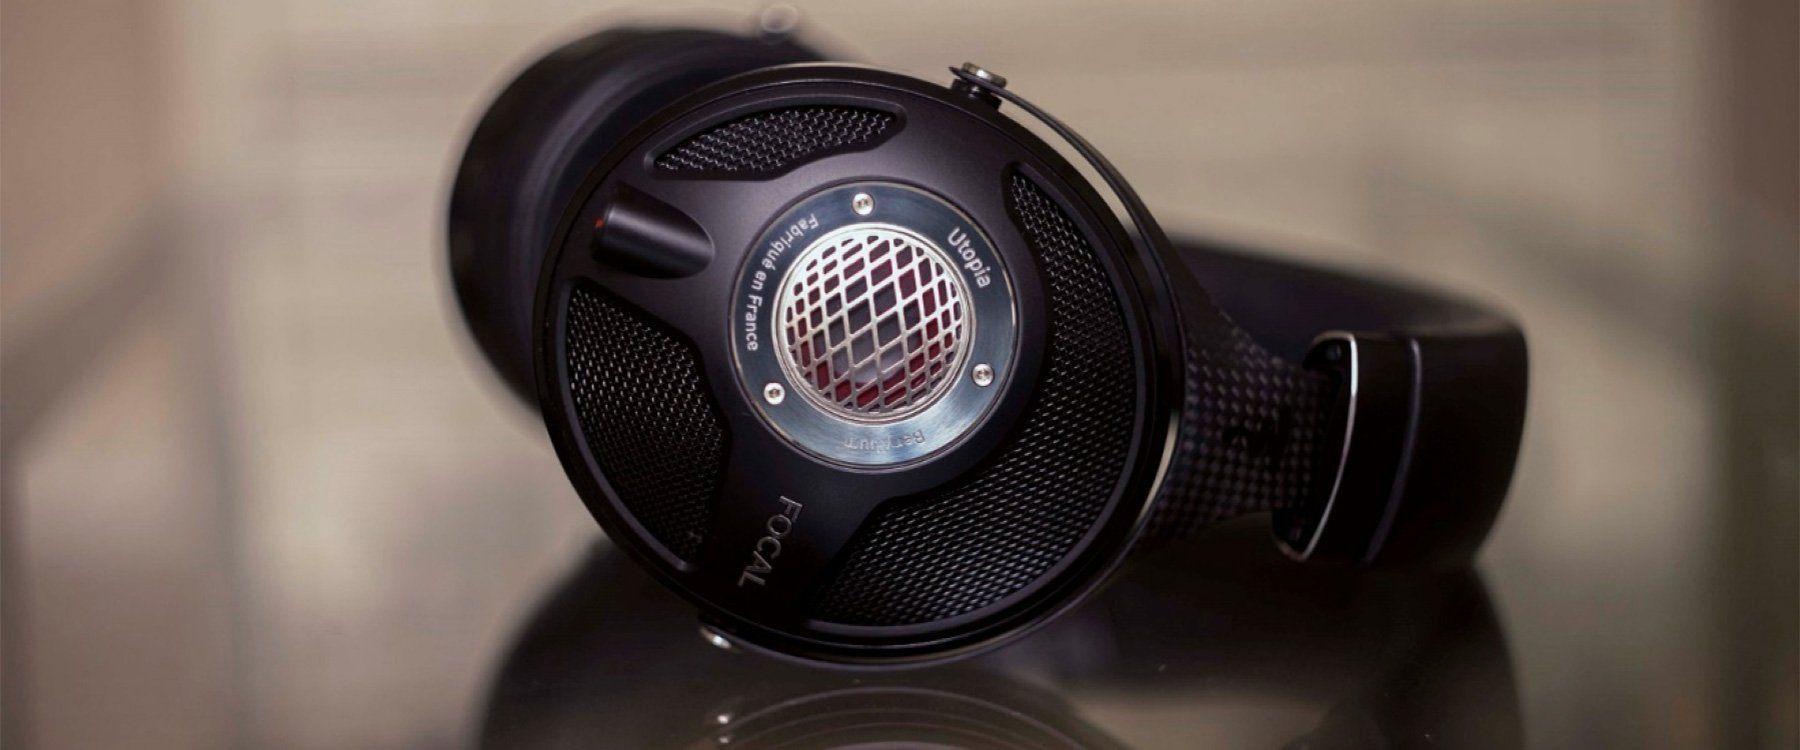 Focal Utopia - Flagship Open-Back Headphone - Review